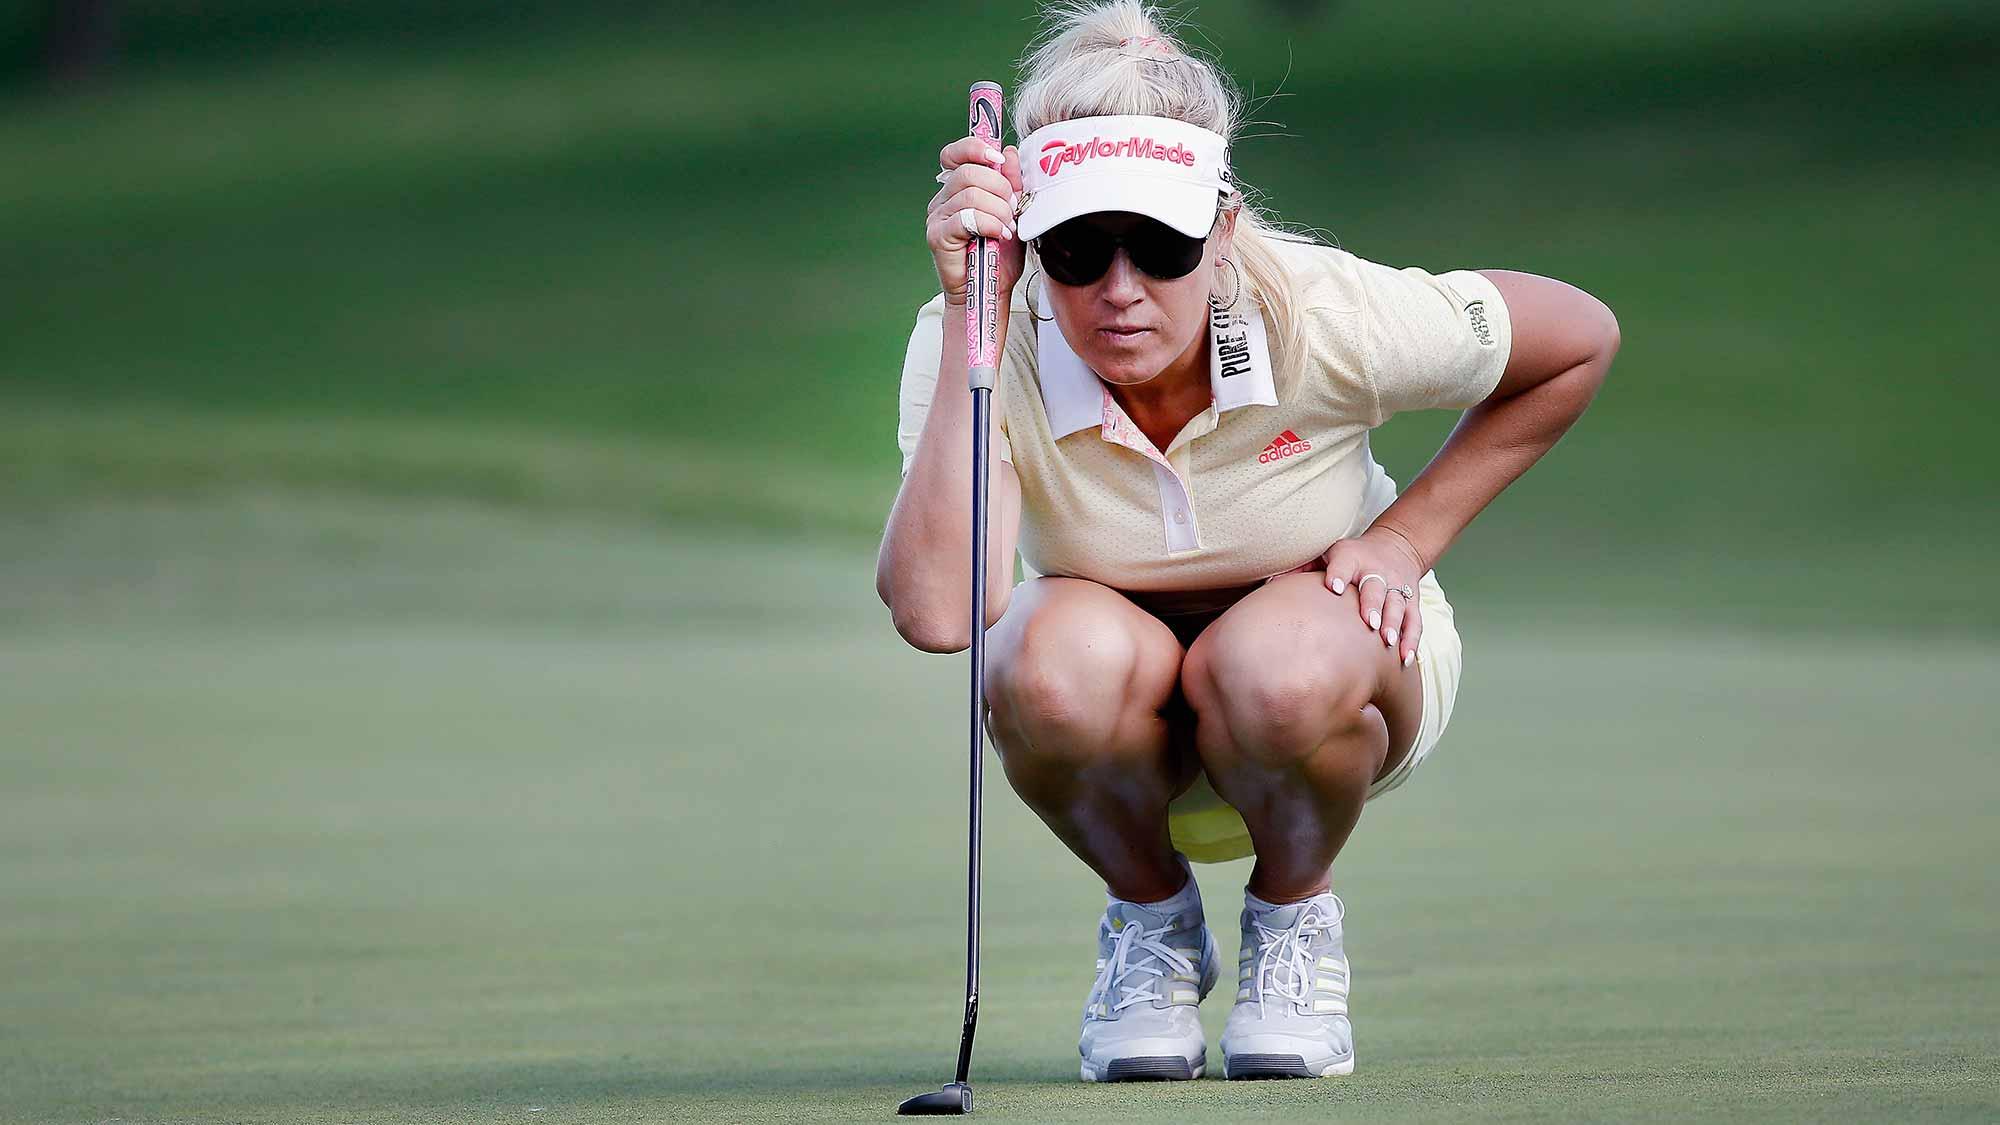 Natalie Gulbis Shares Tip On Making Three-Footers | LPGA ...